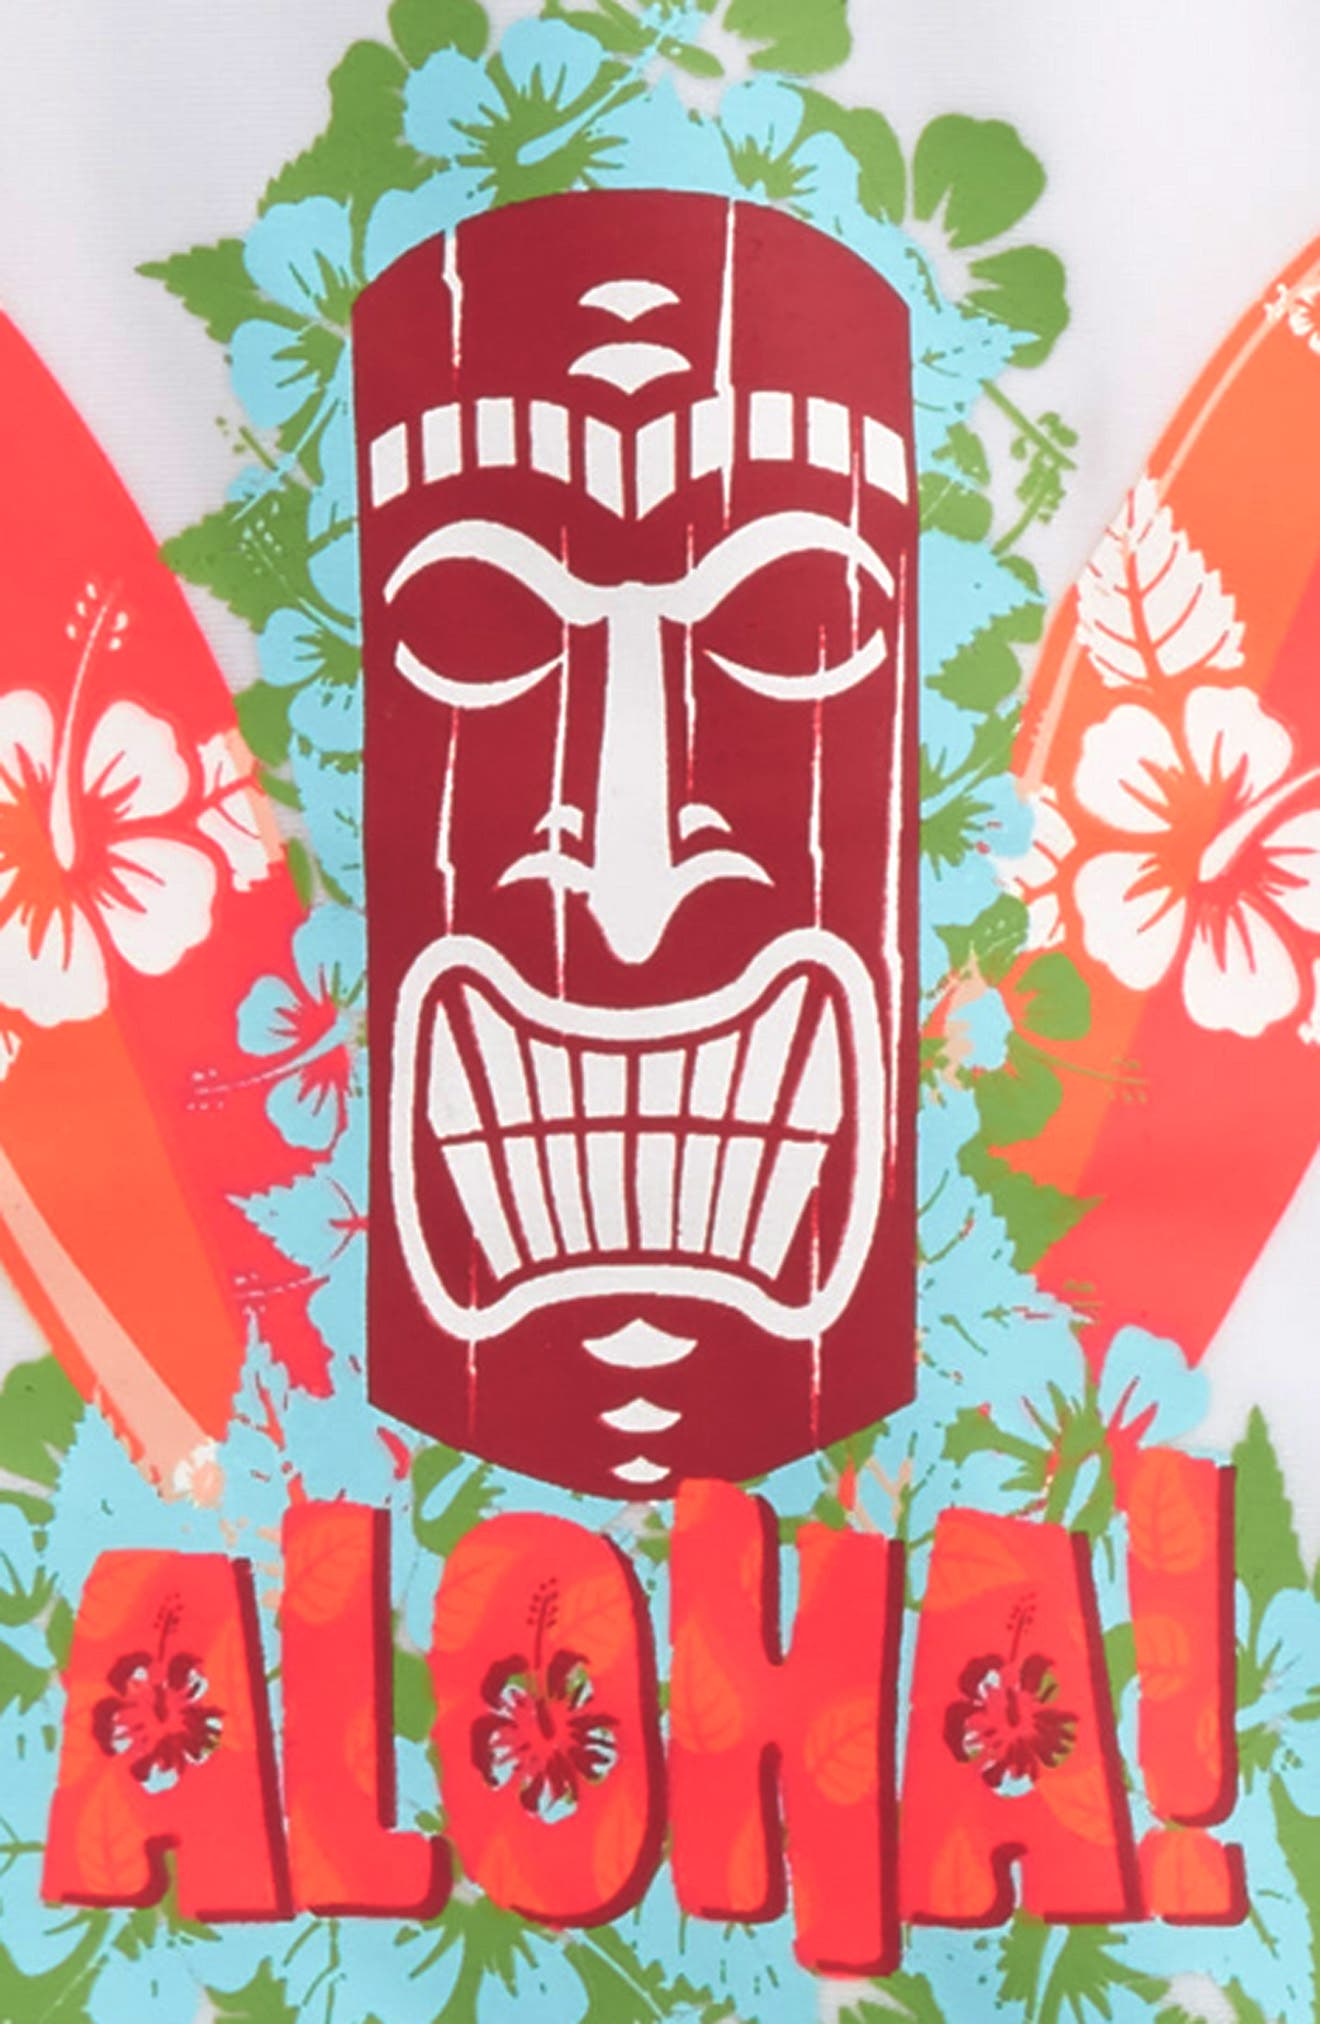 Aloha Tiki Two-Piece Rashguard Swimsuit,                             Alternate thumbnail 2, color,                             440